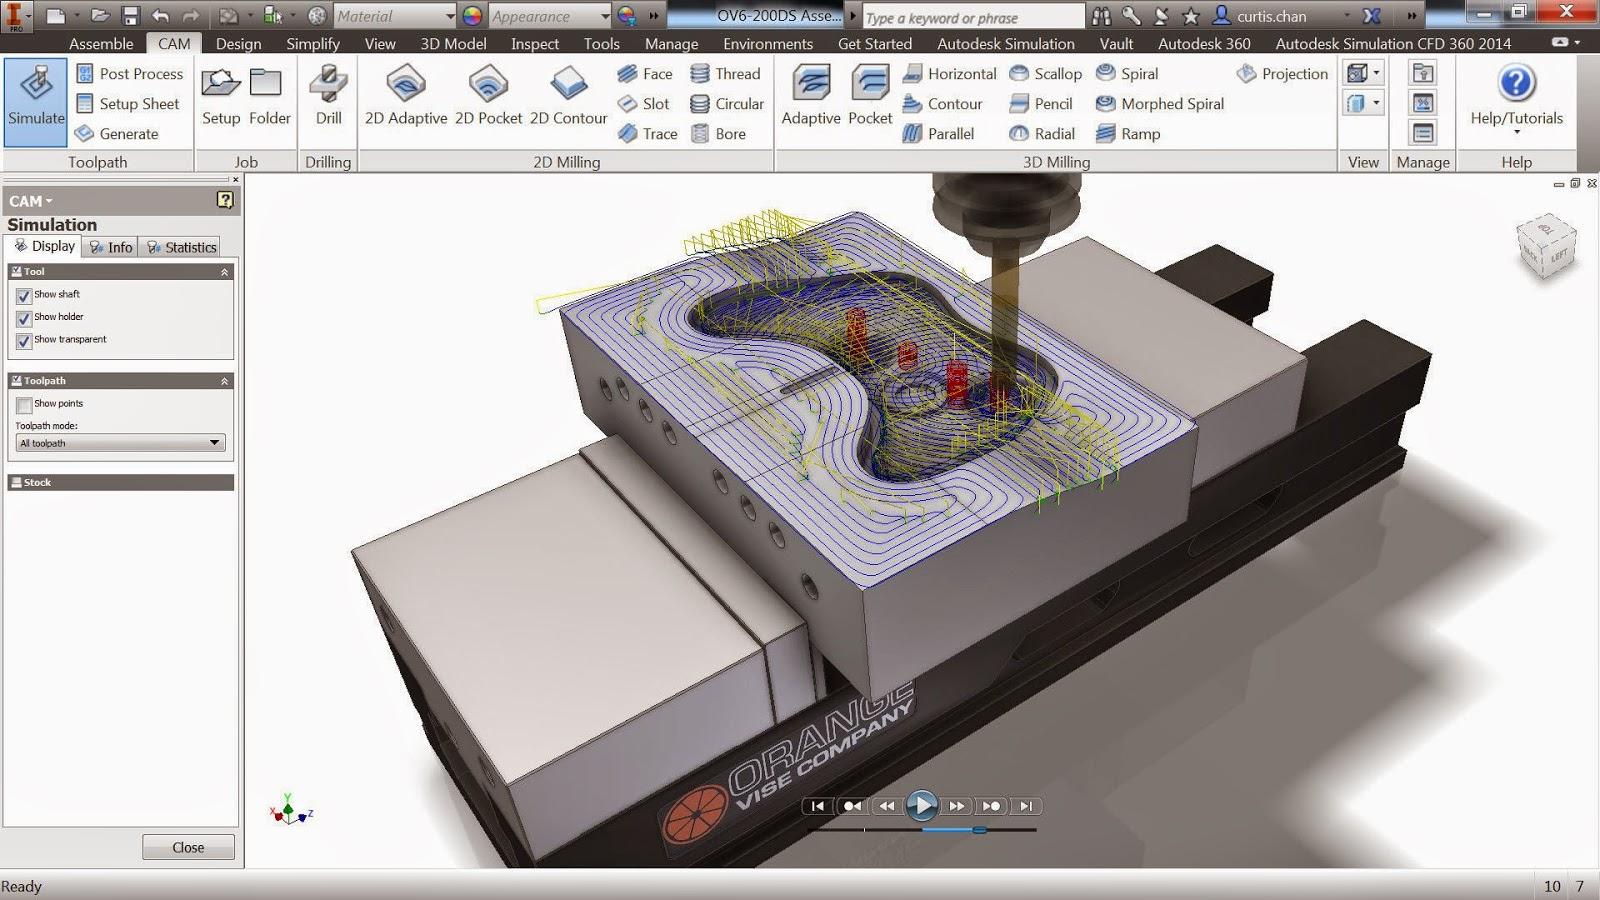 Autodesk inventor professional 2017 update 1 build 170  x86x64